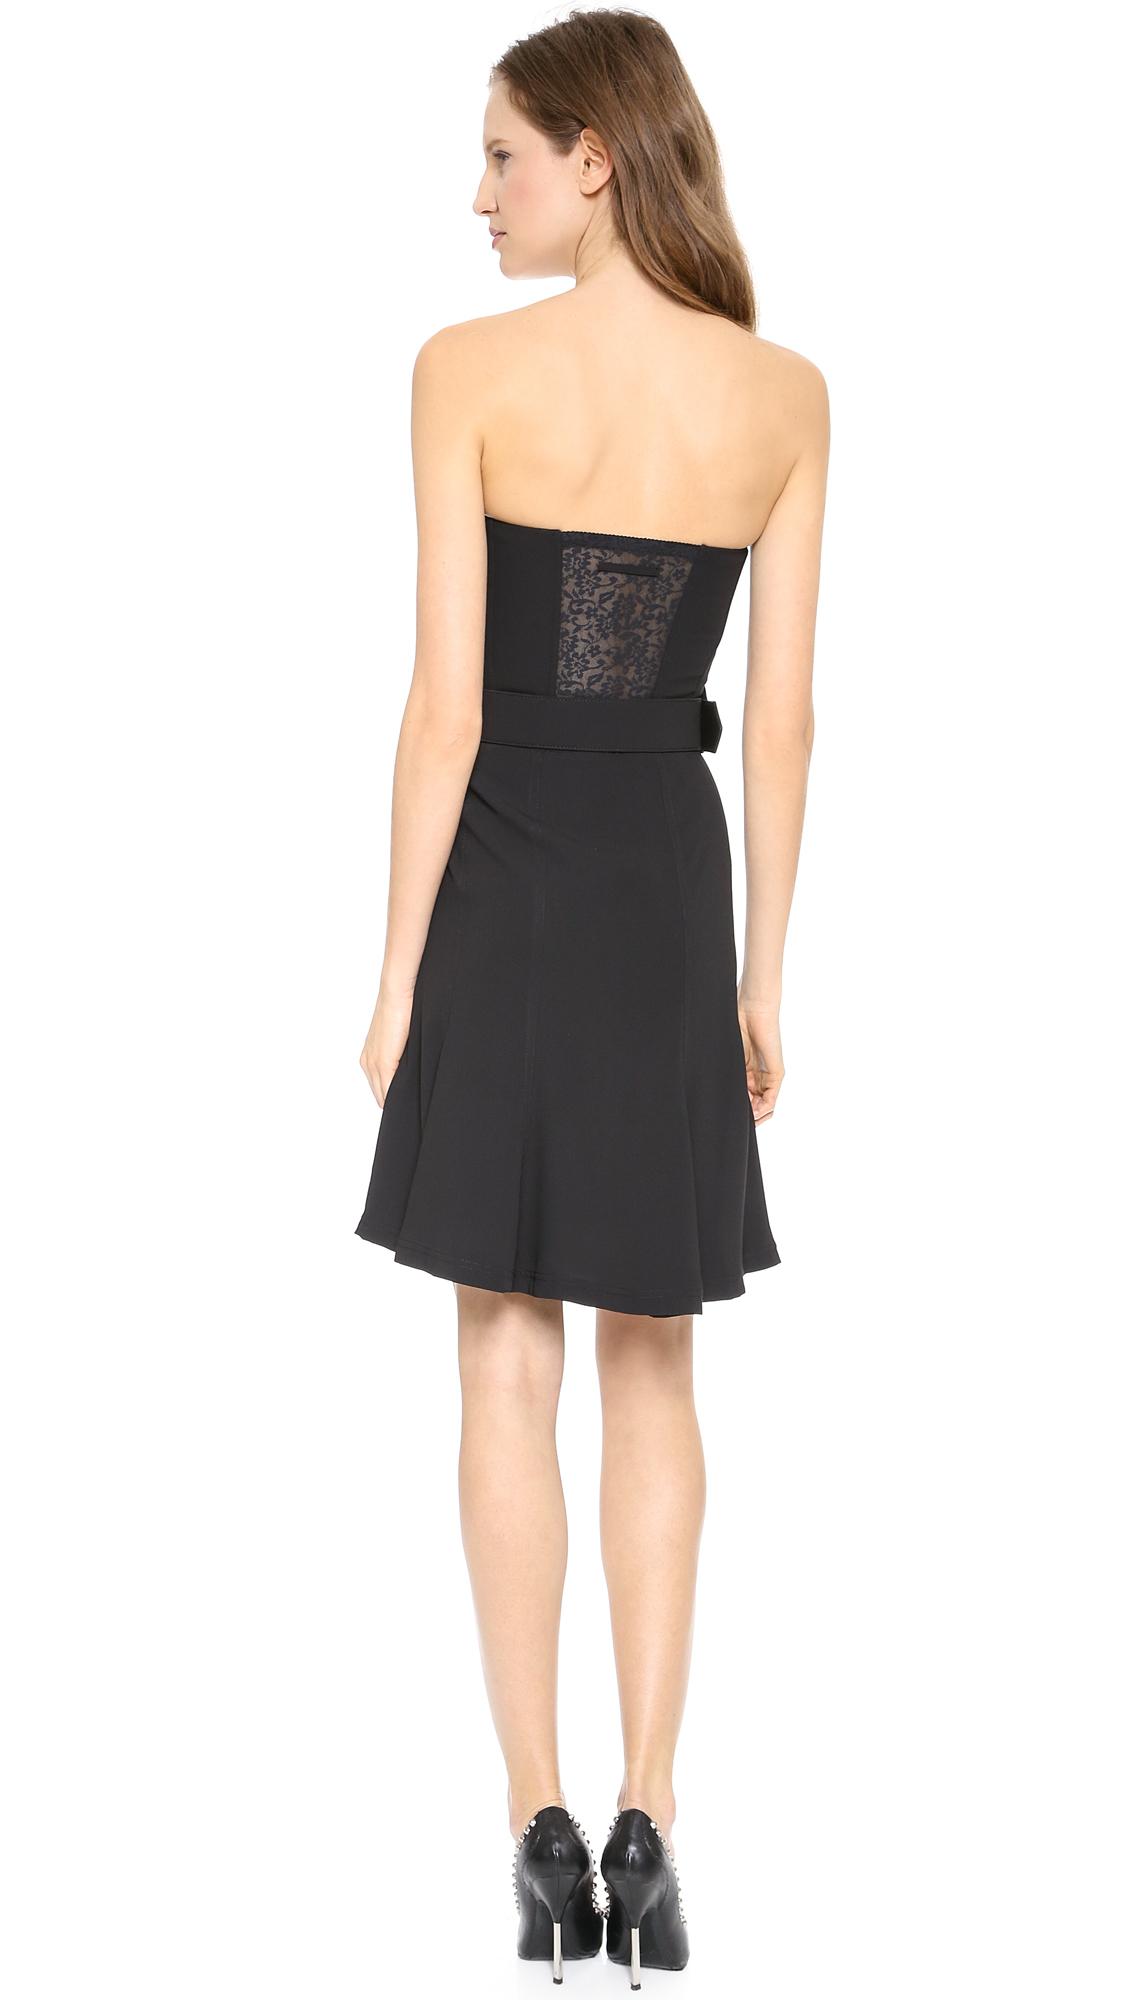 lyst jean paul gaultier strapless bustier dress black. Black Bedroom Furniture Sets. Home Design Ideas